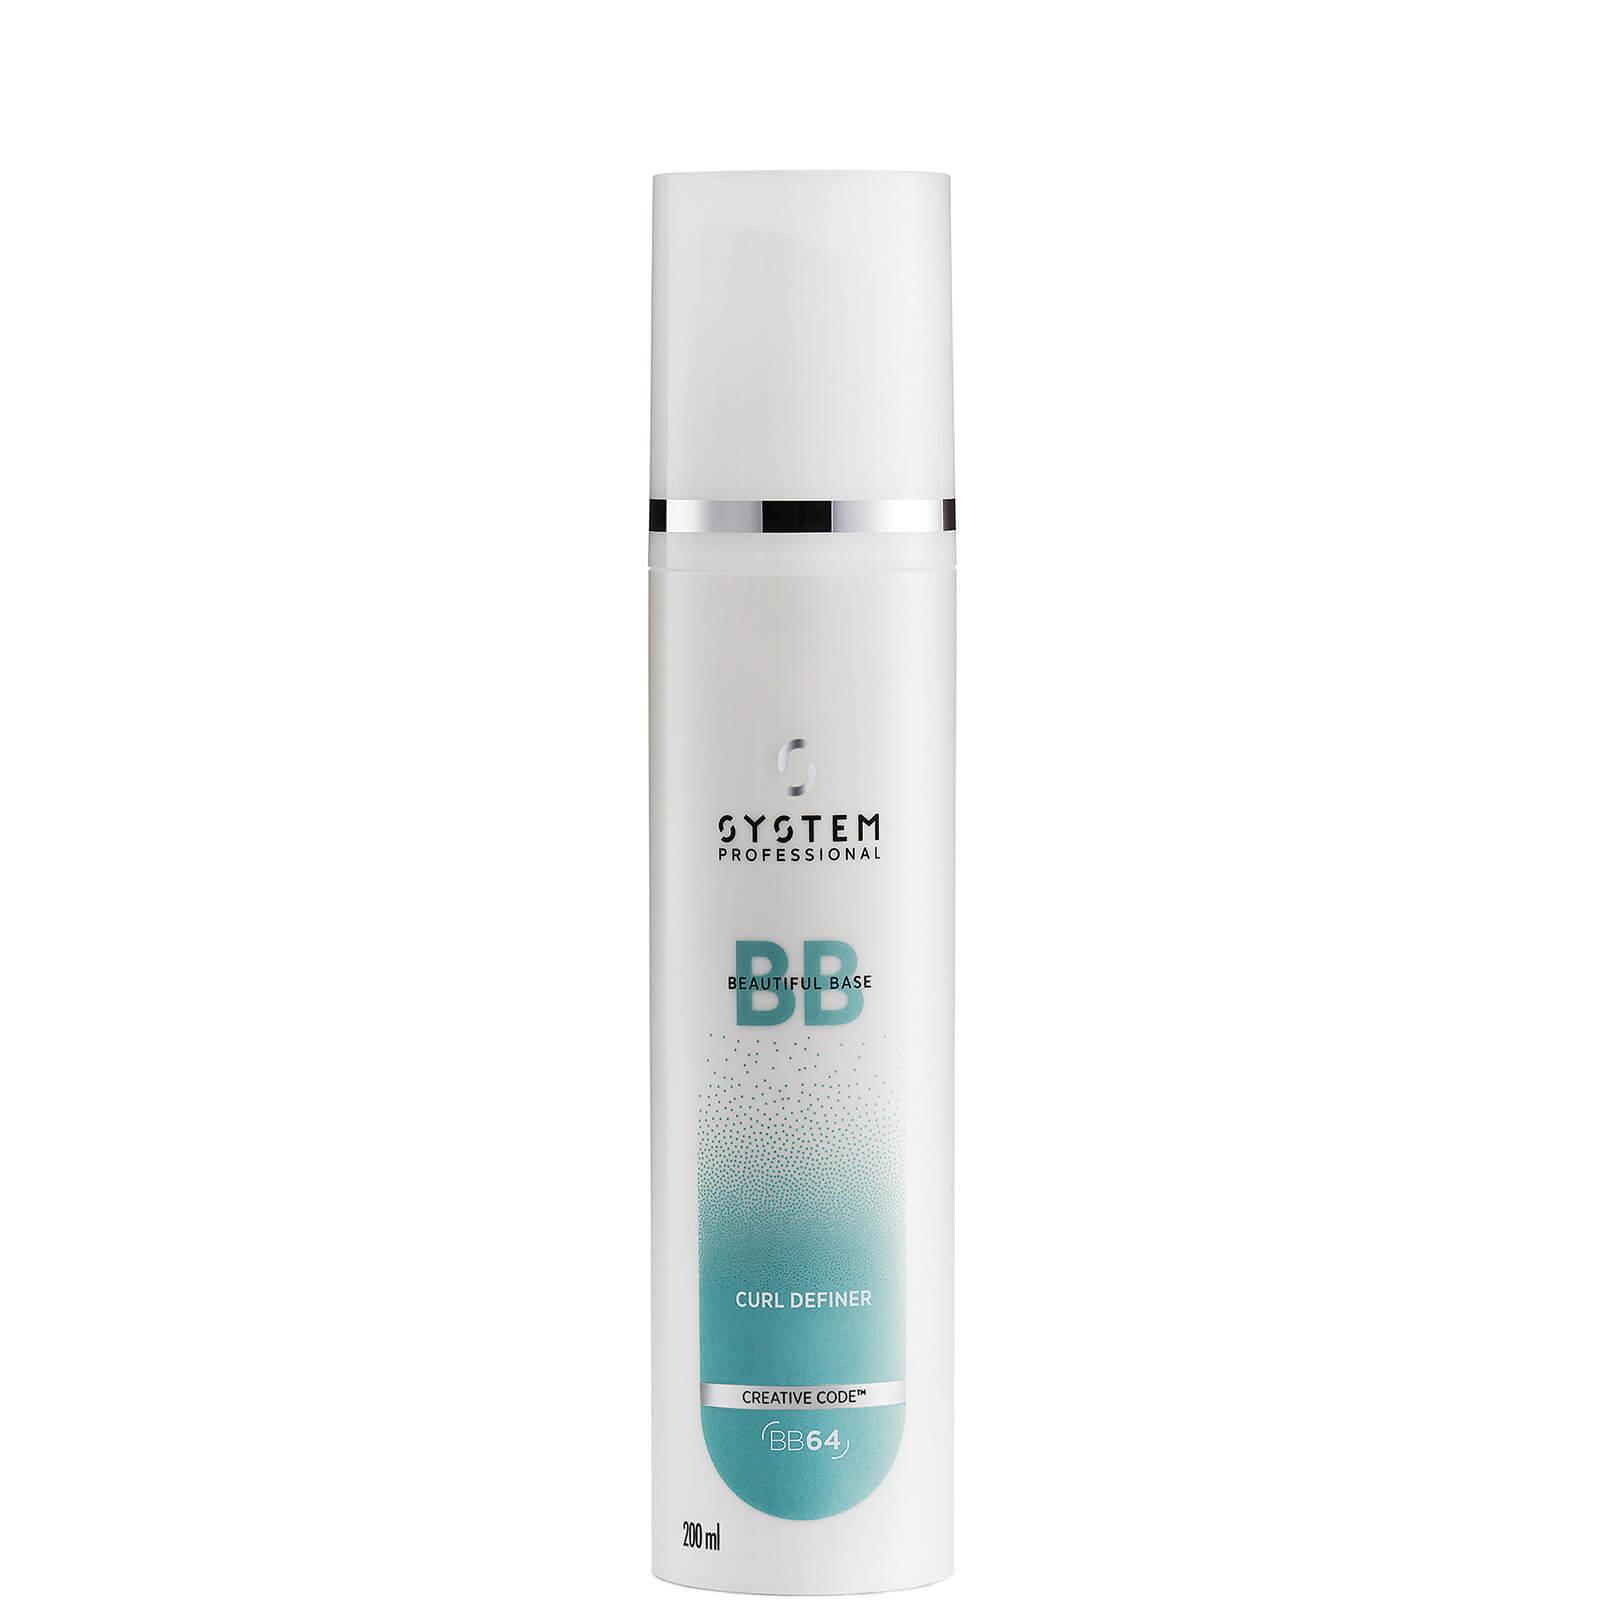 System Professional BB Curl Definer Cream 200ml